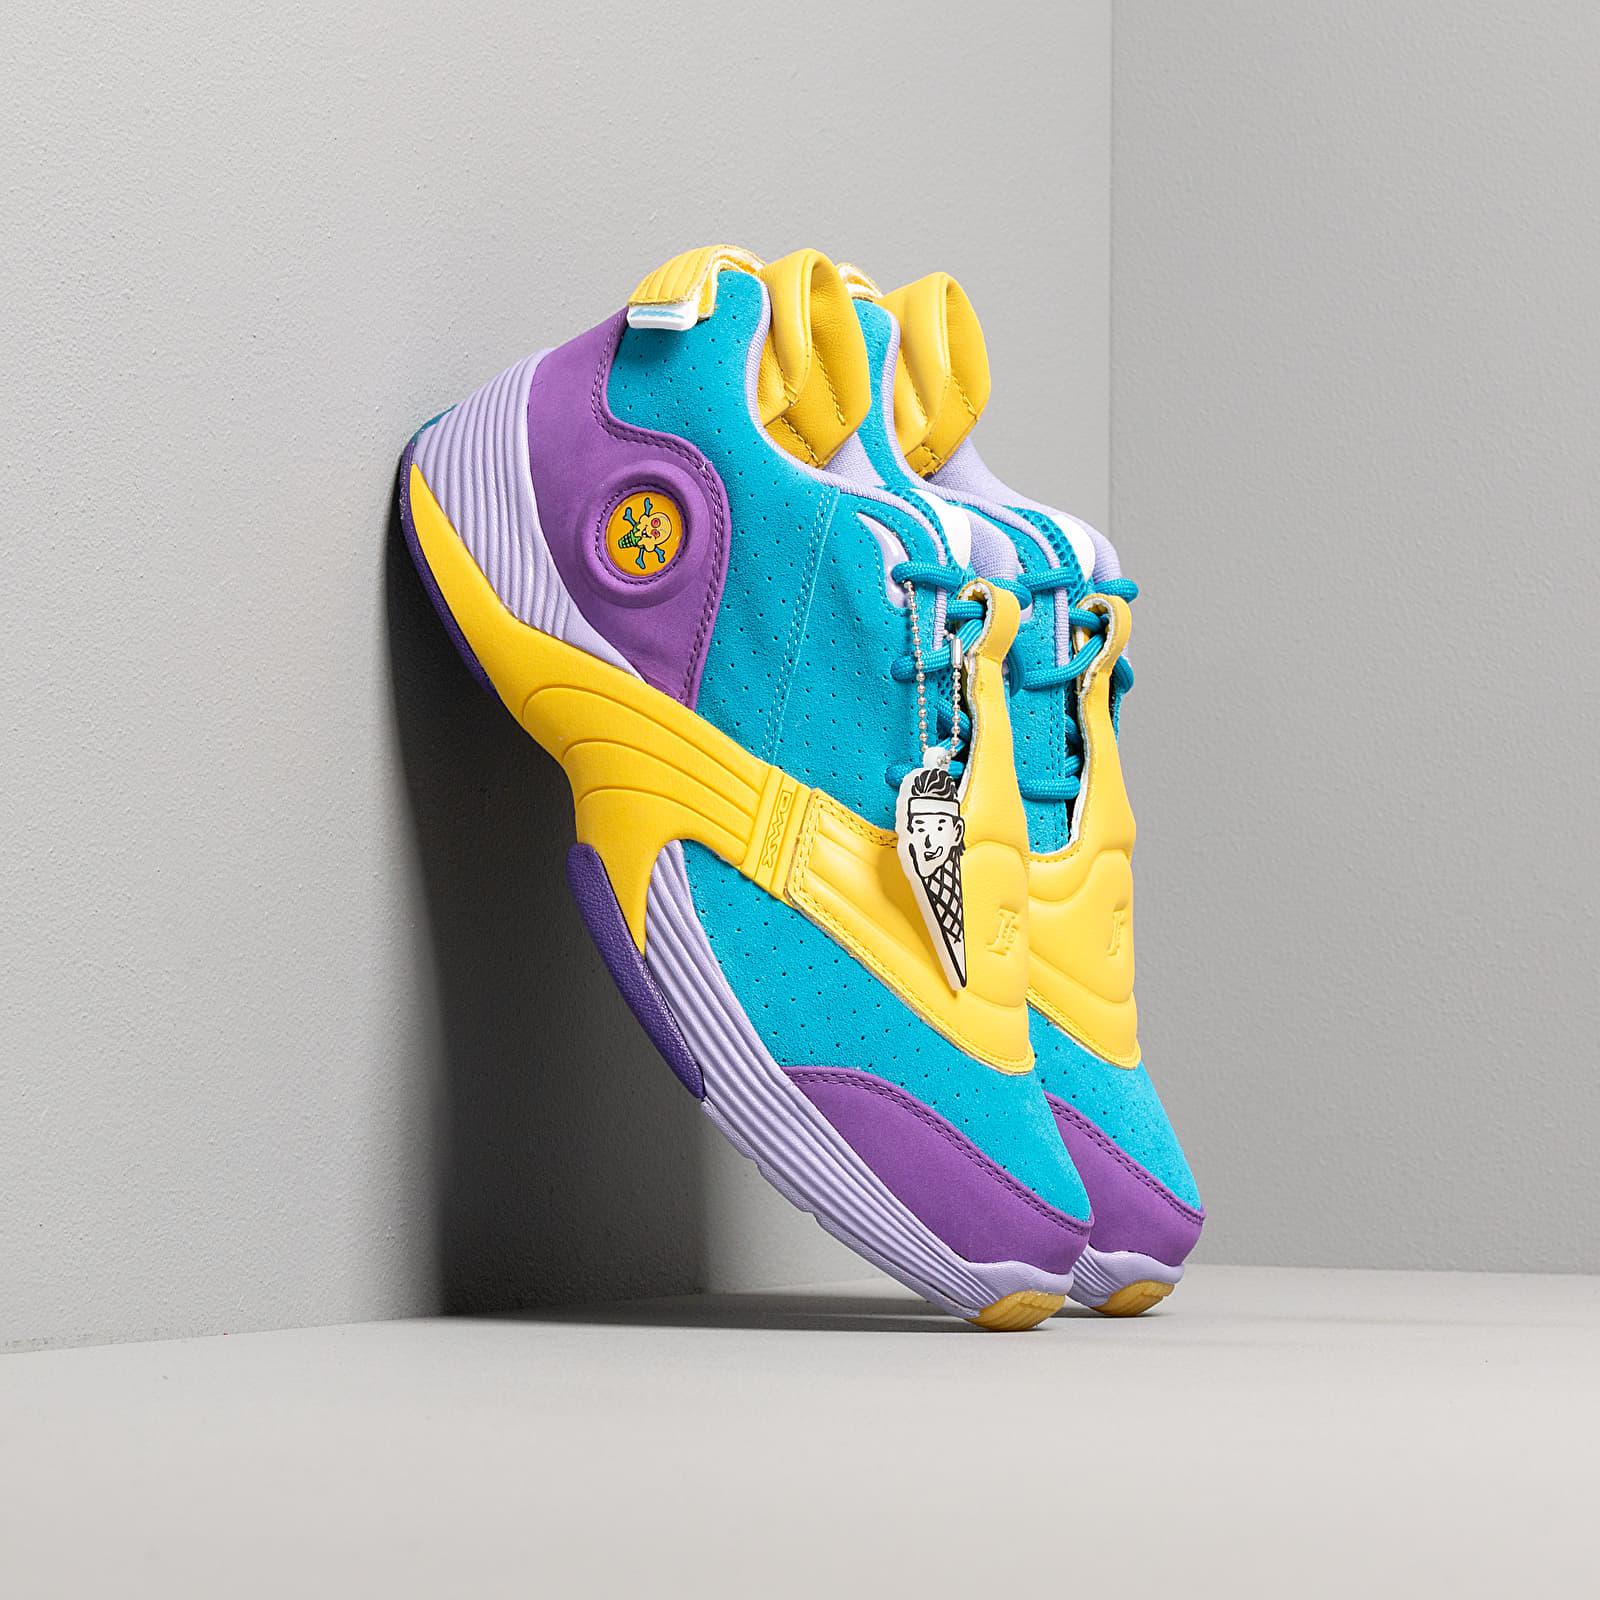 Încălțăminte și sneakerși pentru bărbați Reebok x Billionaire Boys Club Answer V MU Malibu Blue/ Regal Purple/ Boldly Yellow